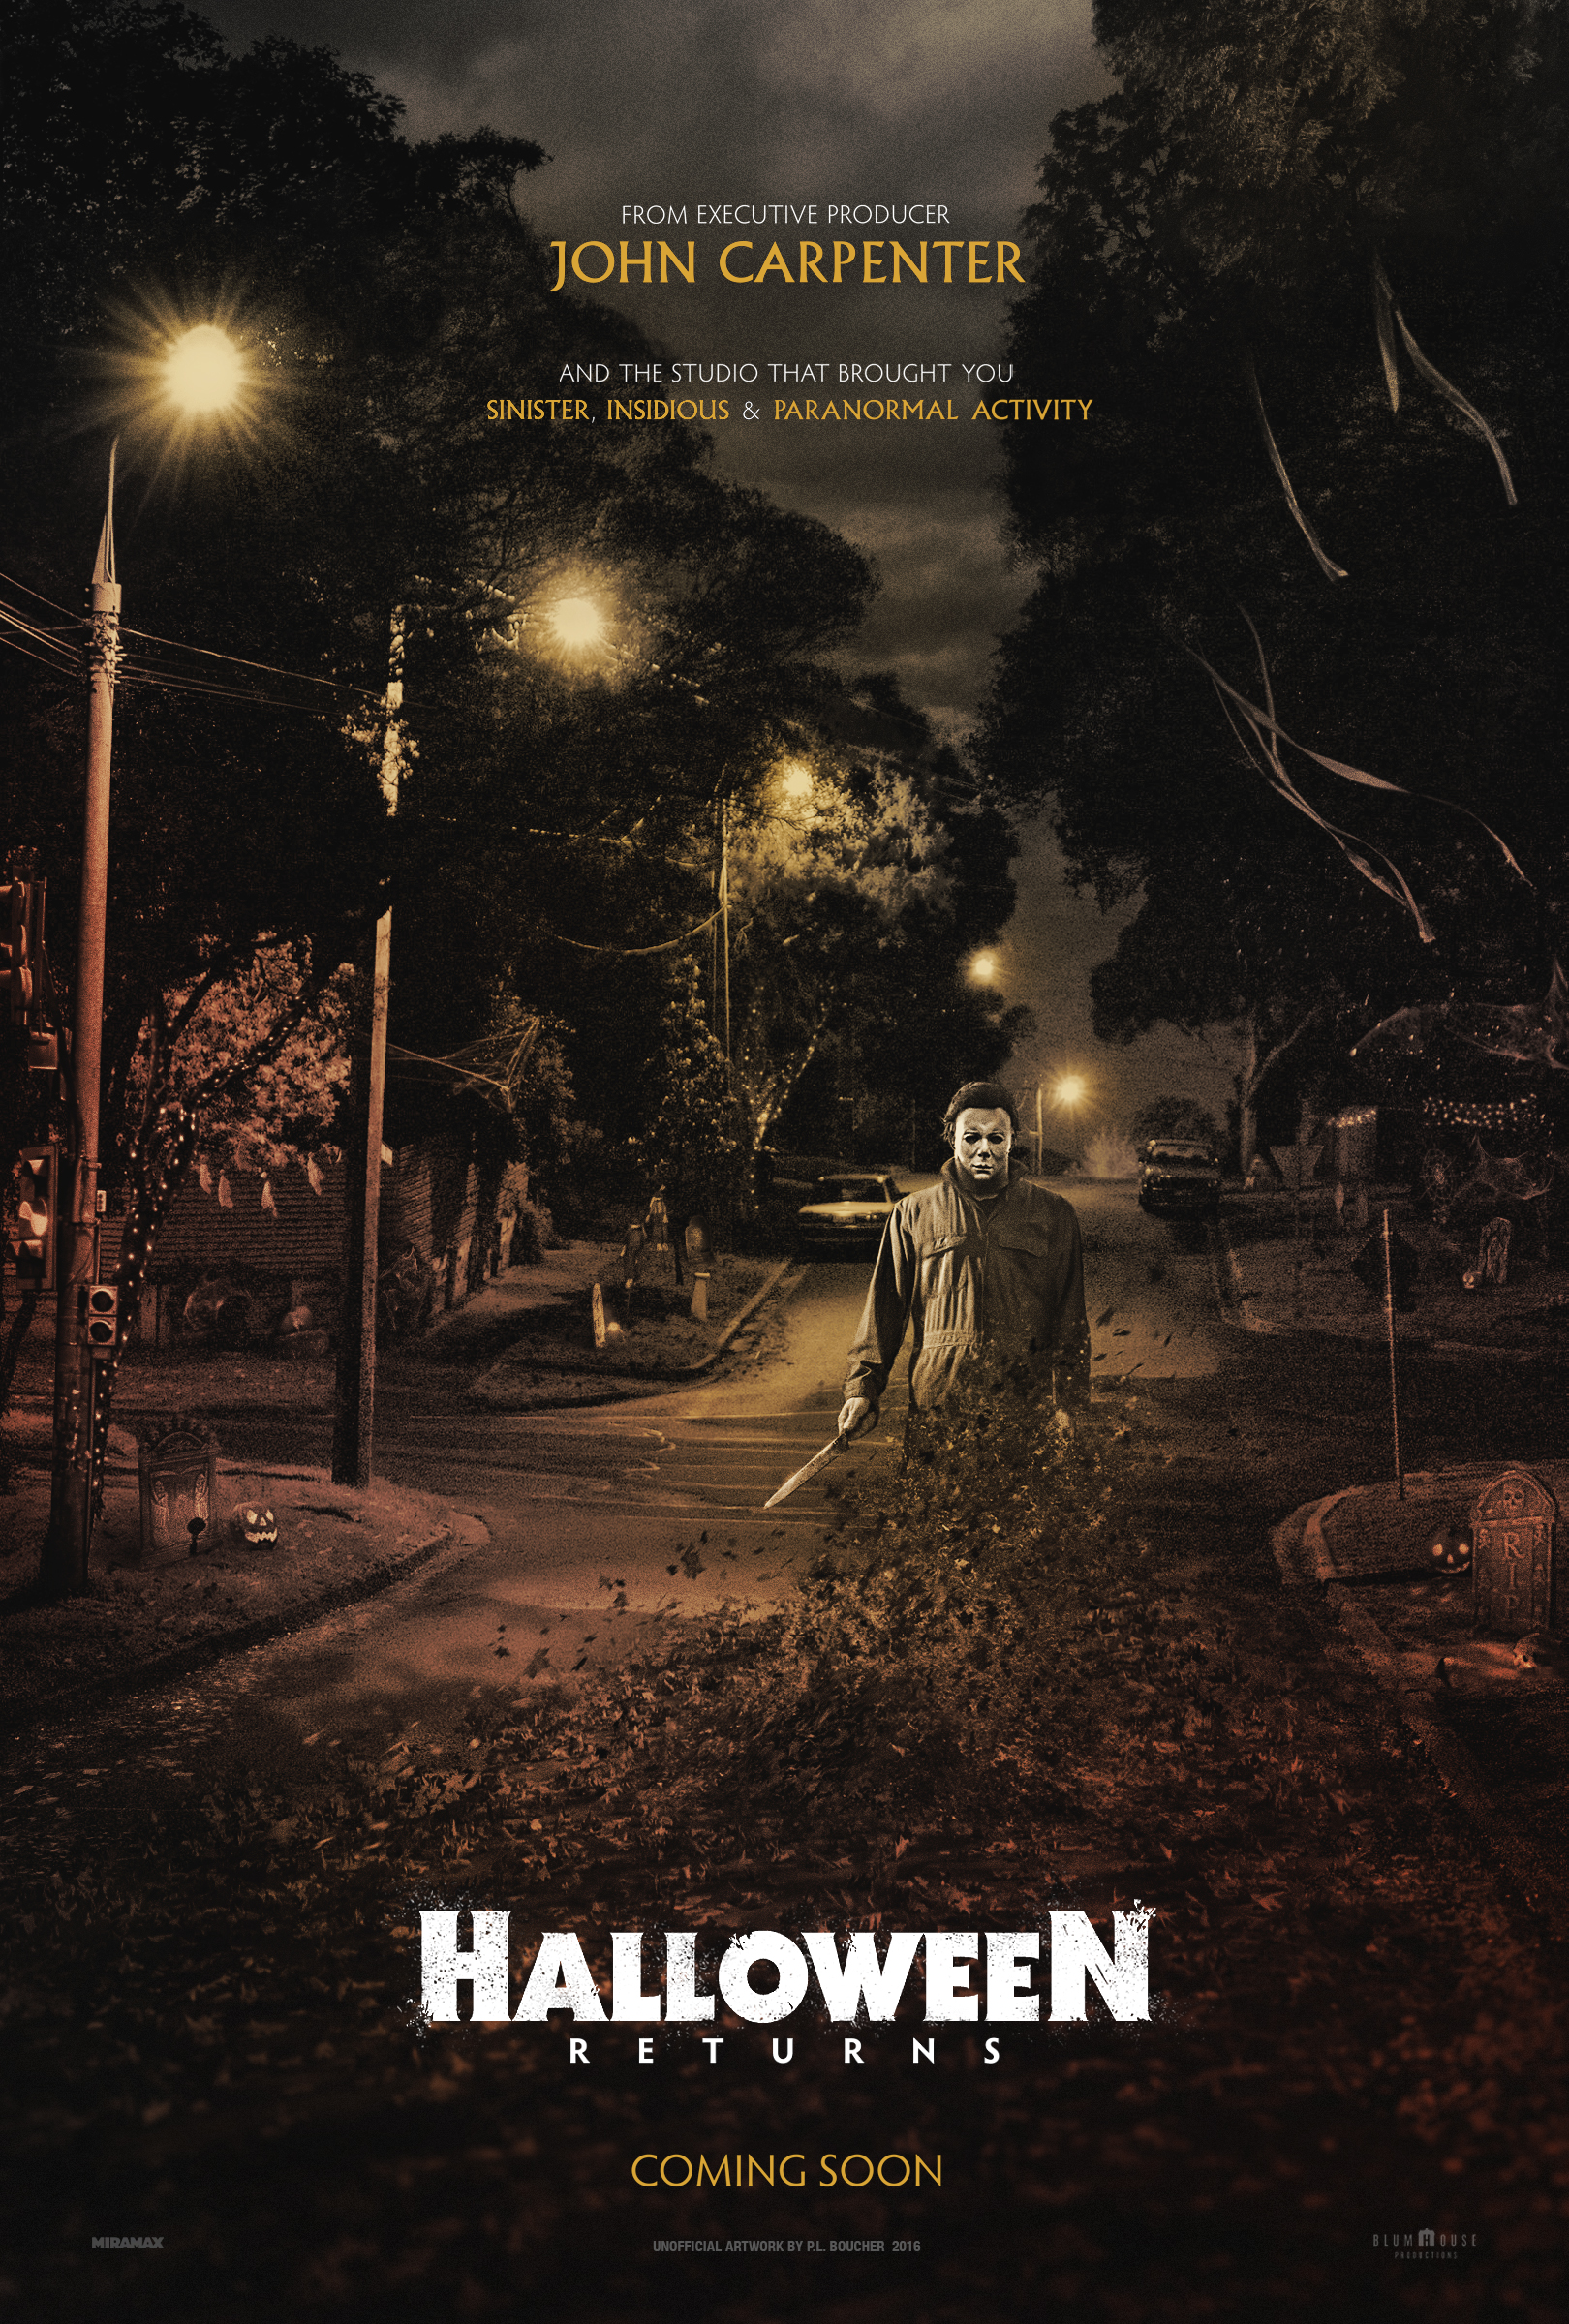 Halloween Returns - Poster 2 by themadbutcher on DeviantArt